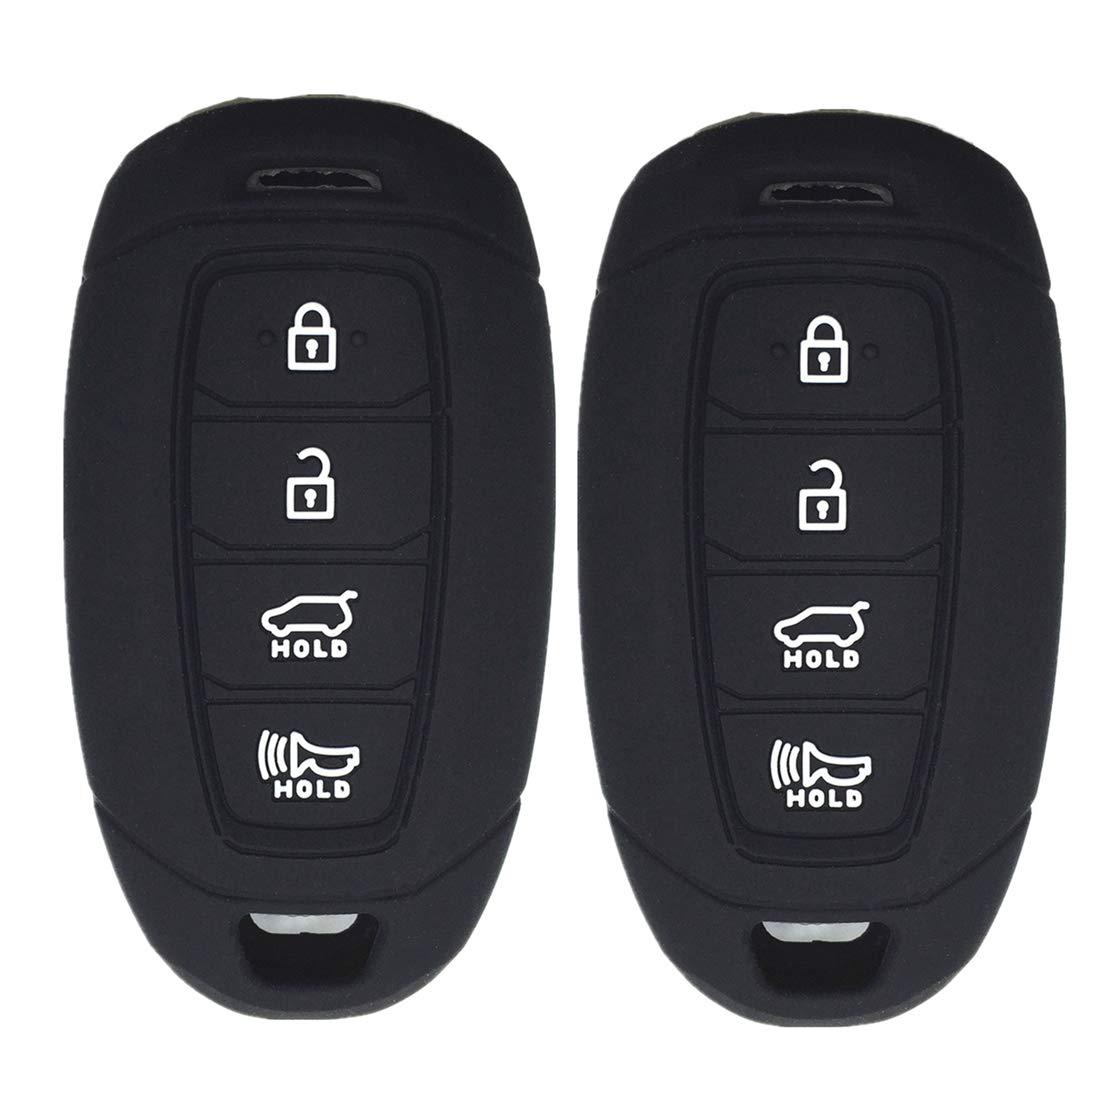 Ezzy Auto Black and Rose Silicone Rubber Key Fob Case Key Covers Key Jacket Skin Protectors fit for Hyundai Kona Azera Grandeur IG